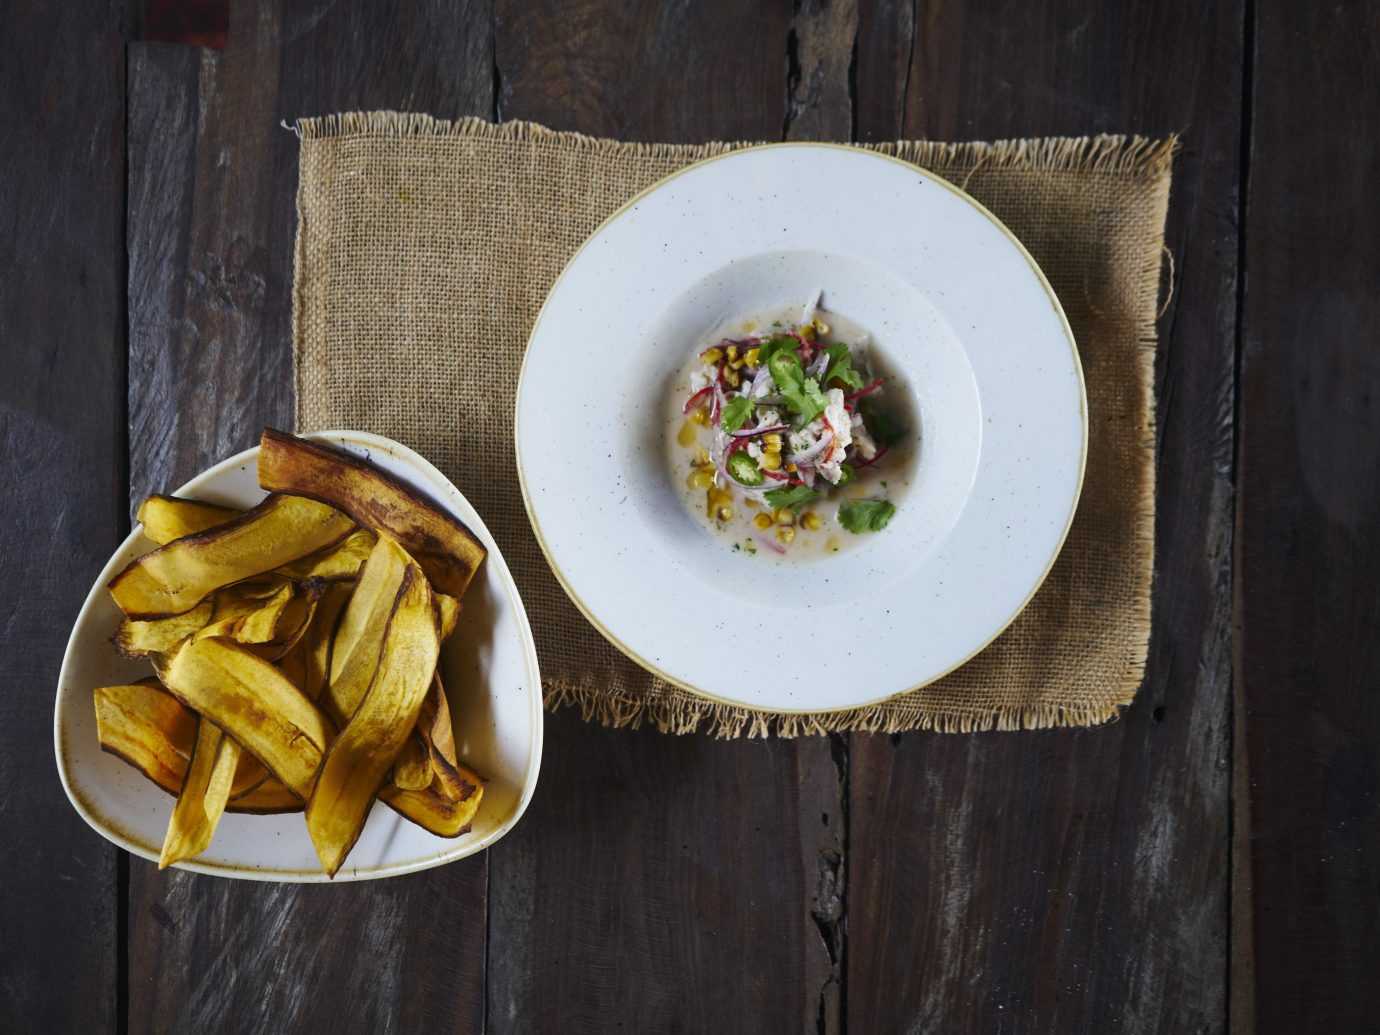 City Mexico Trip Ideas Tulum wooden dish food vegetarian food meal breakfast tableware dip cuisine brunch recipe side dish wood